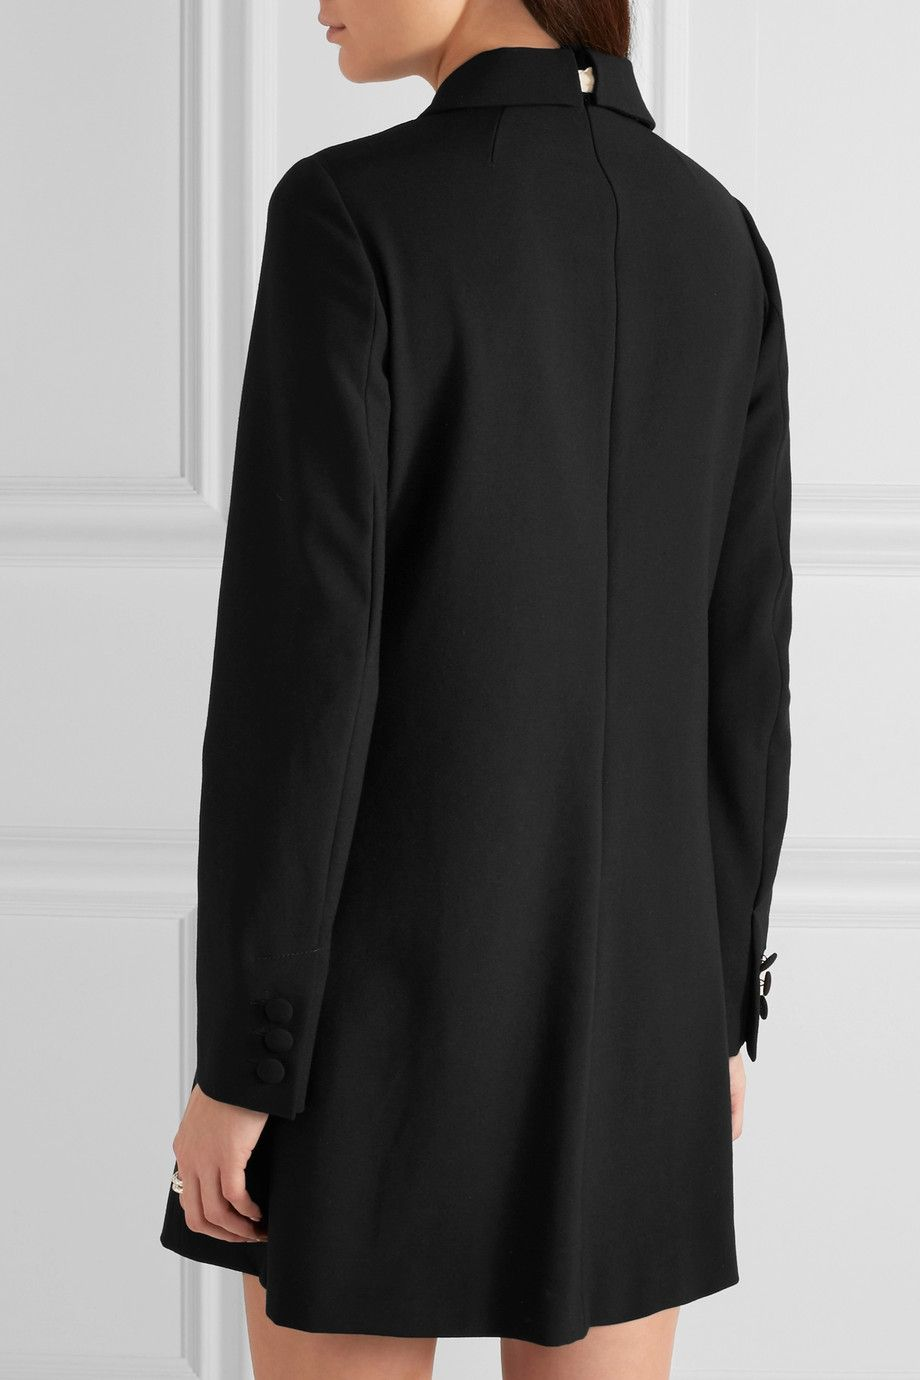 REDValentino | Pussy-bow embellished crepe mini dress | NET-A-PORTER.COM